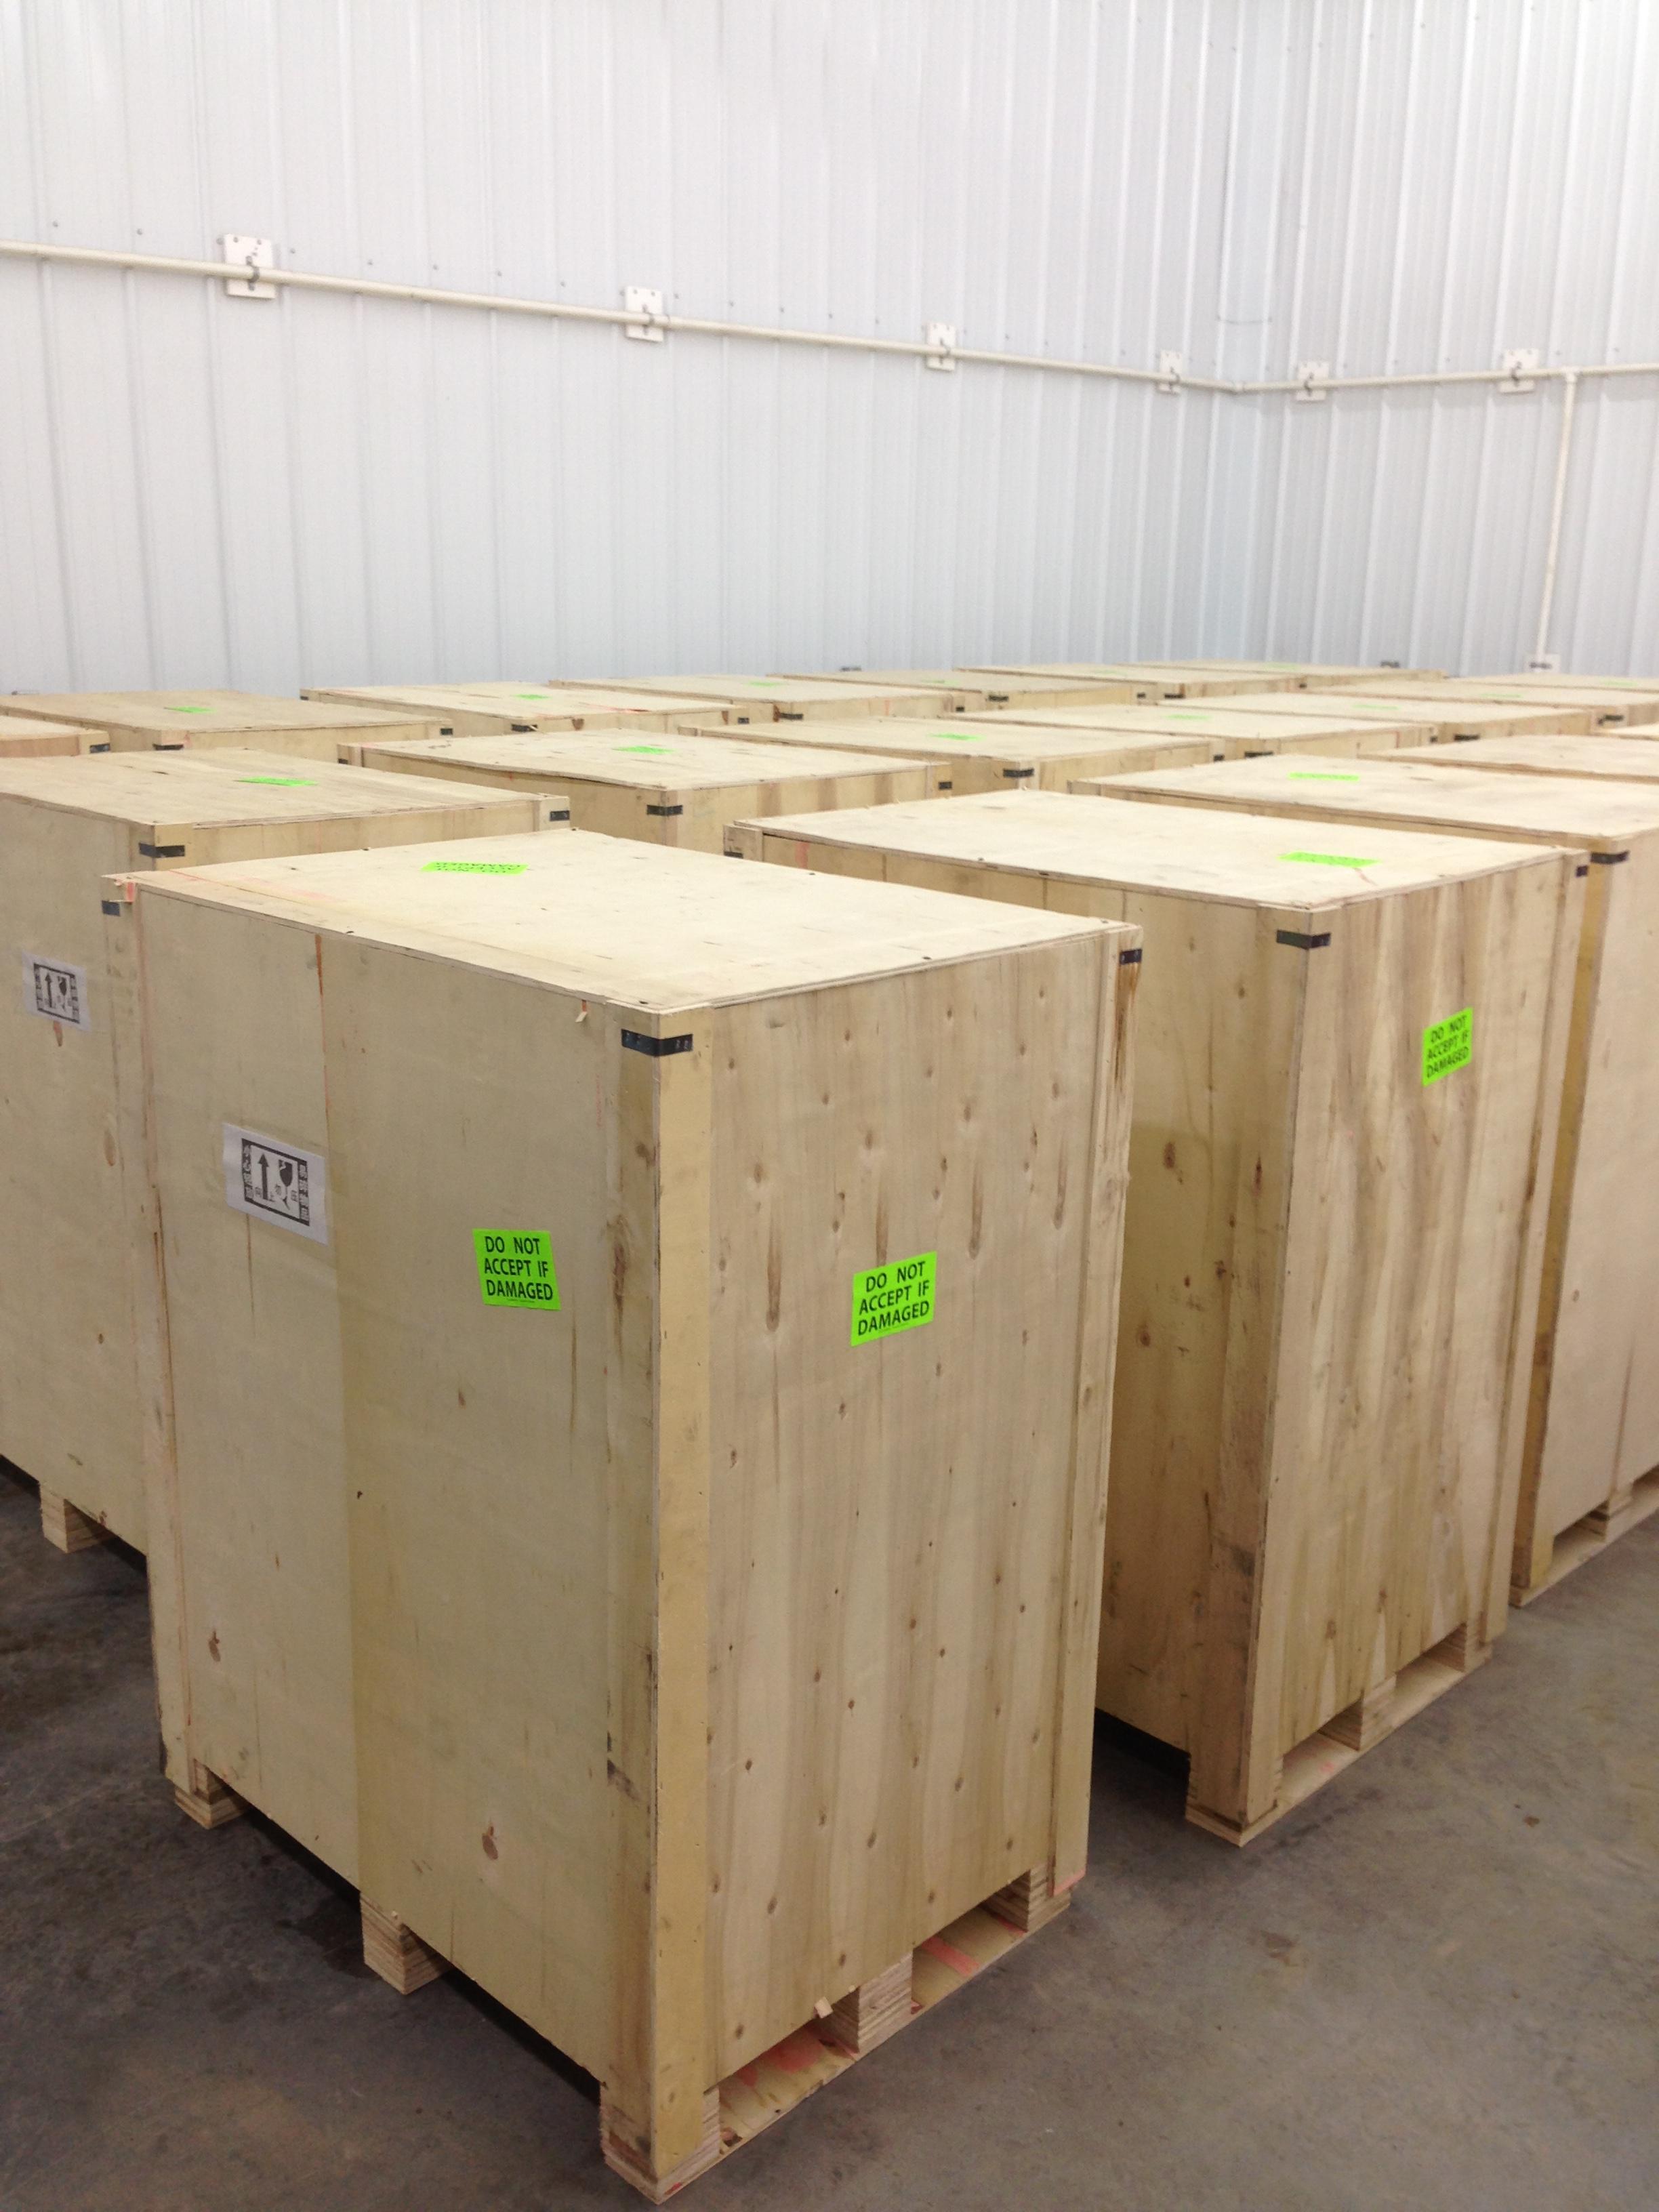 crates 2.JPG?1497746954338